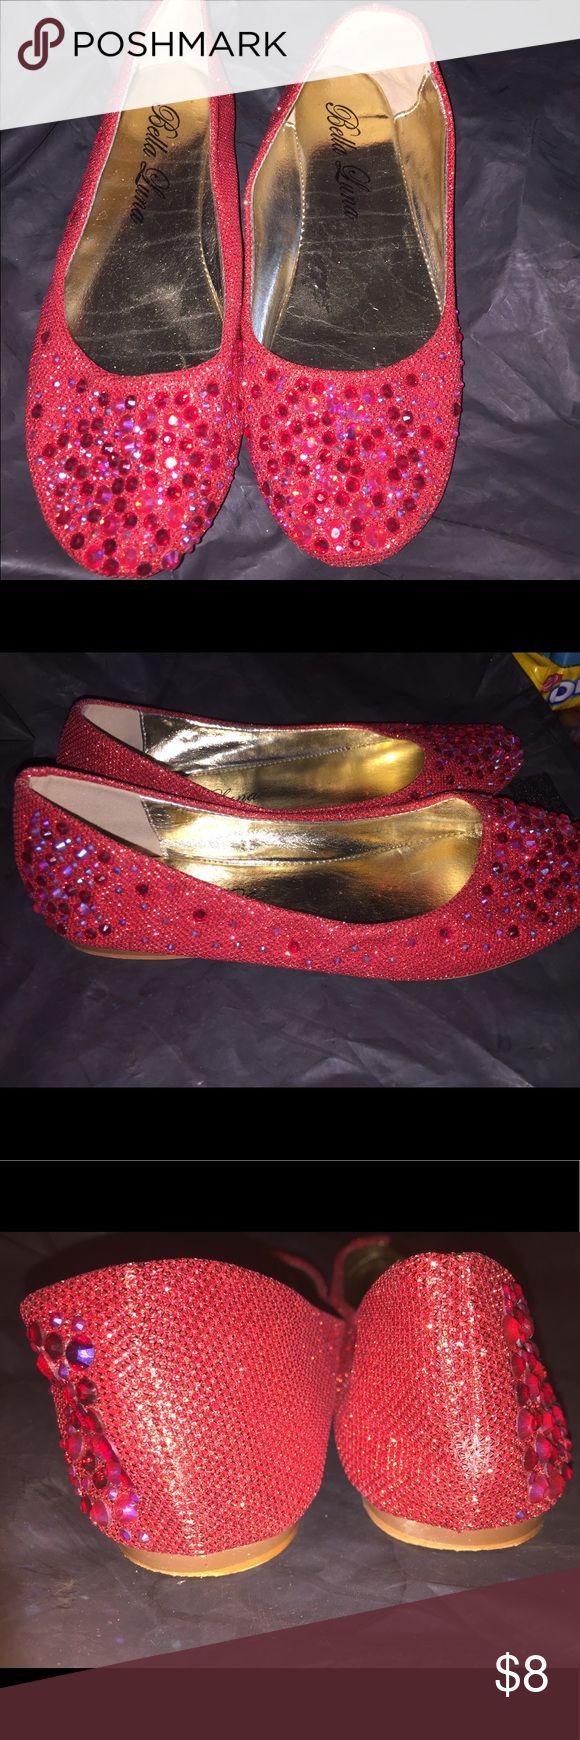 Bella luna Womens size 6 flats Bella Luna women's red embellished flats. Size 6 worn once narrow in front. bella luna Shoes Flats & Loafers